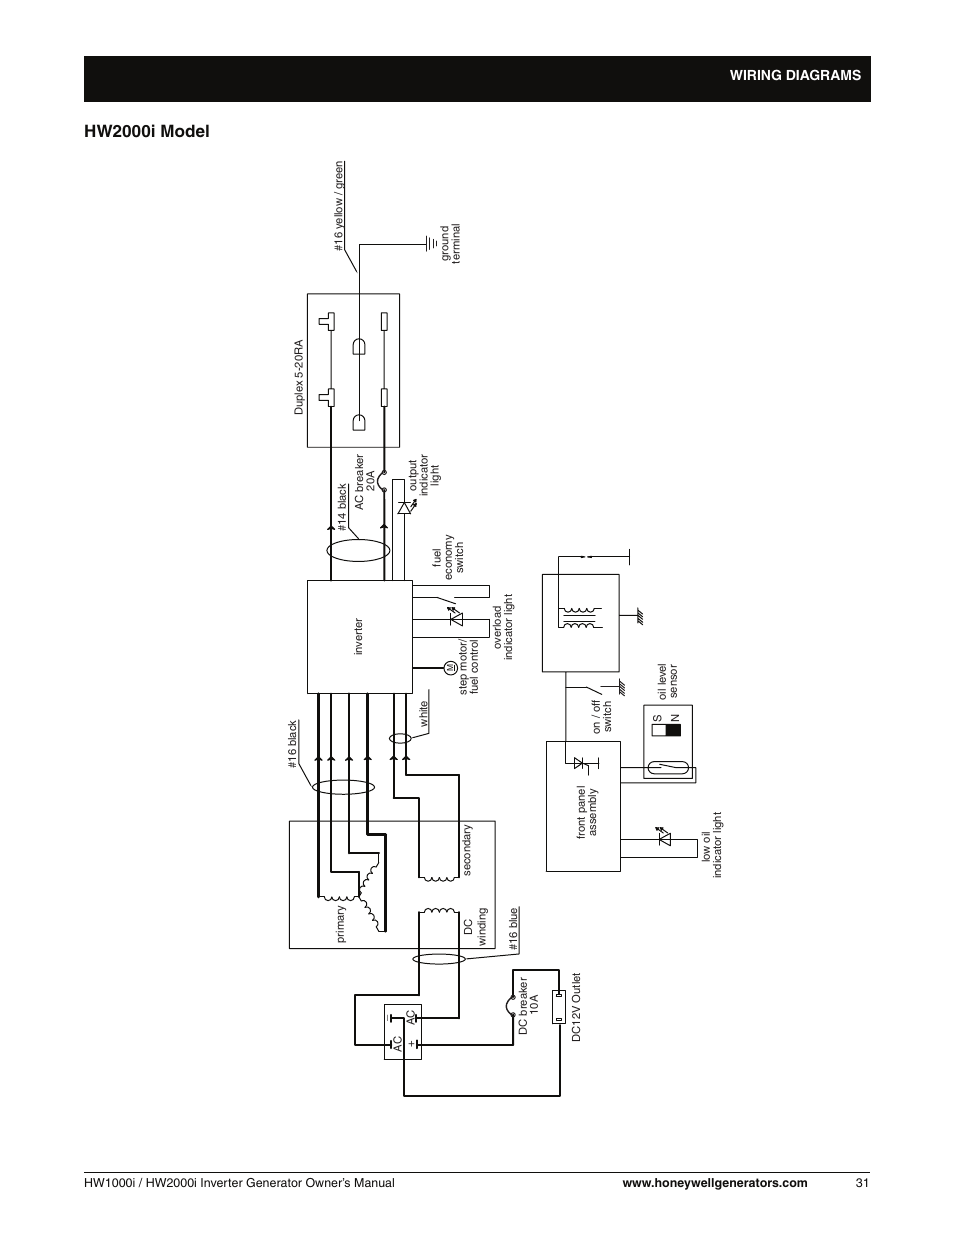 nissancar wiring diagram page 13